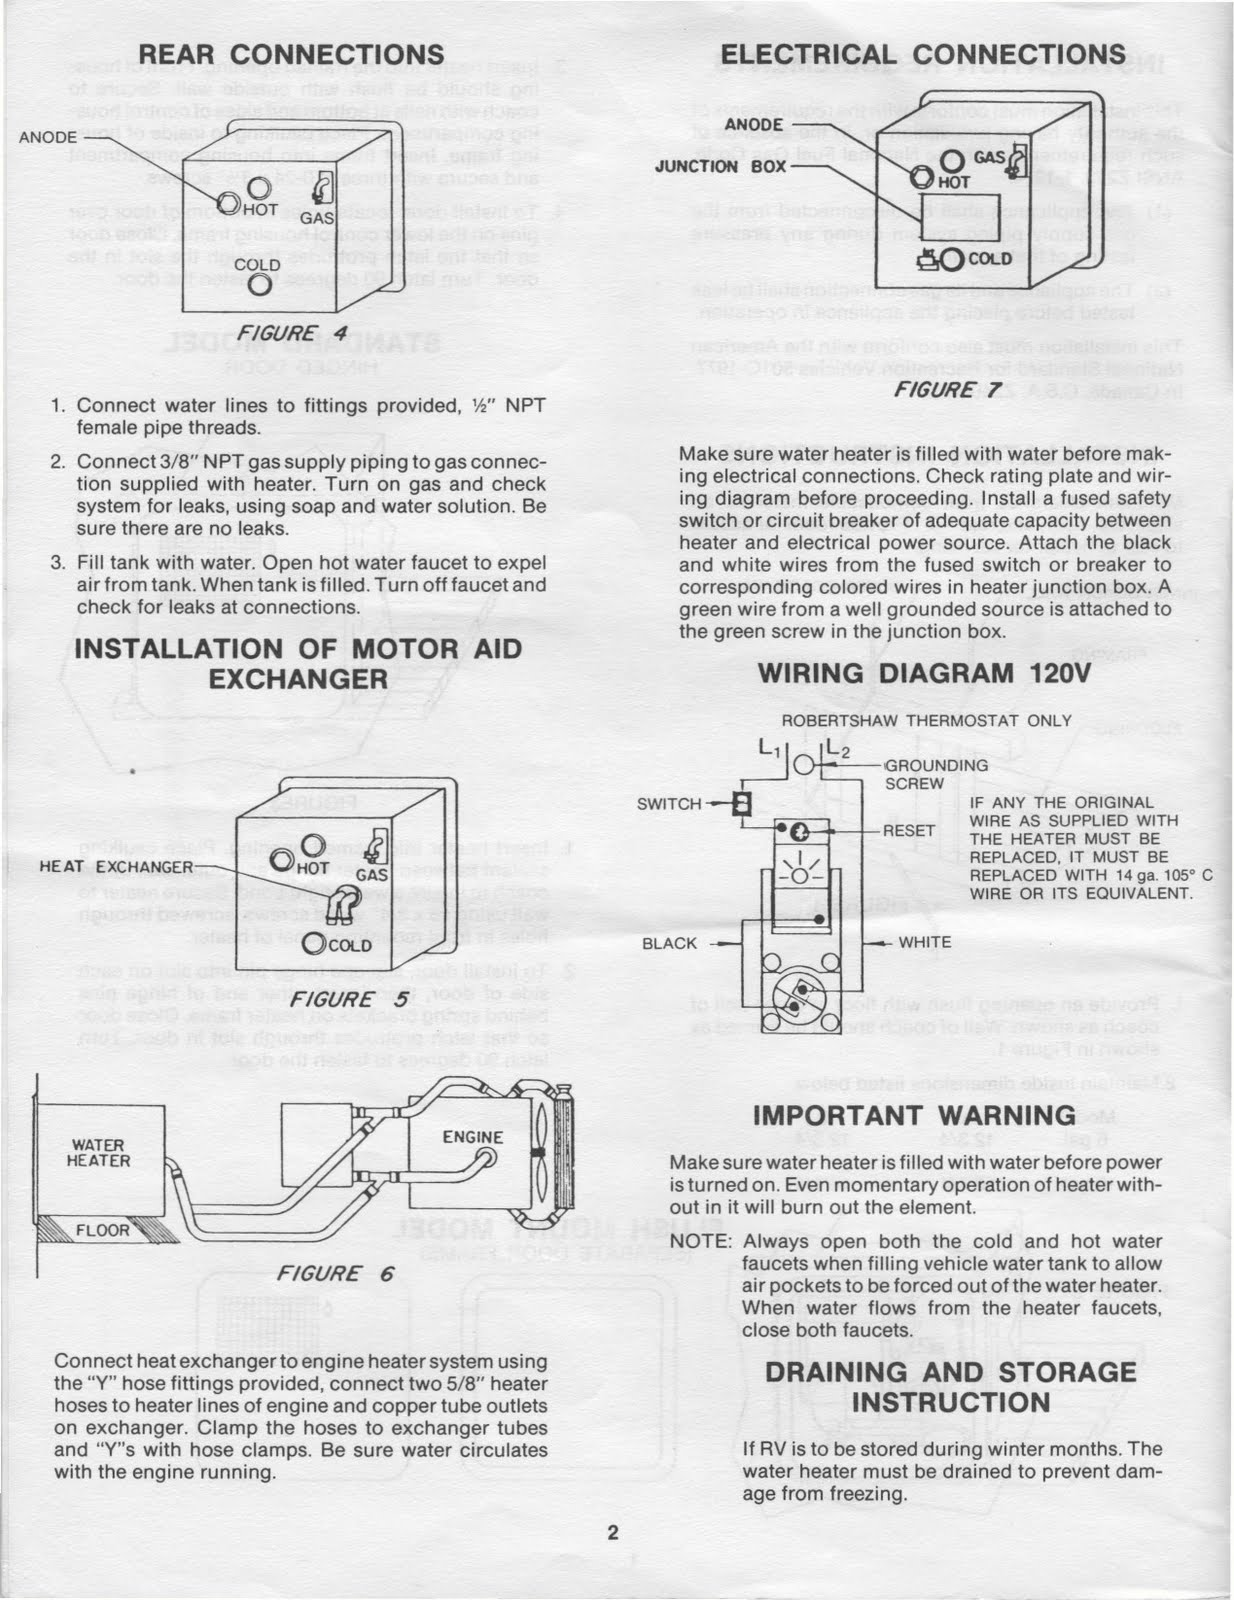 fleetwood rv s power wiring diagram free download